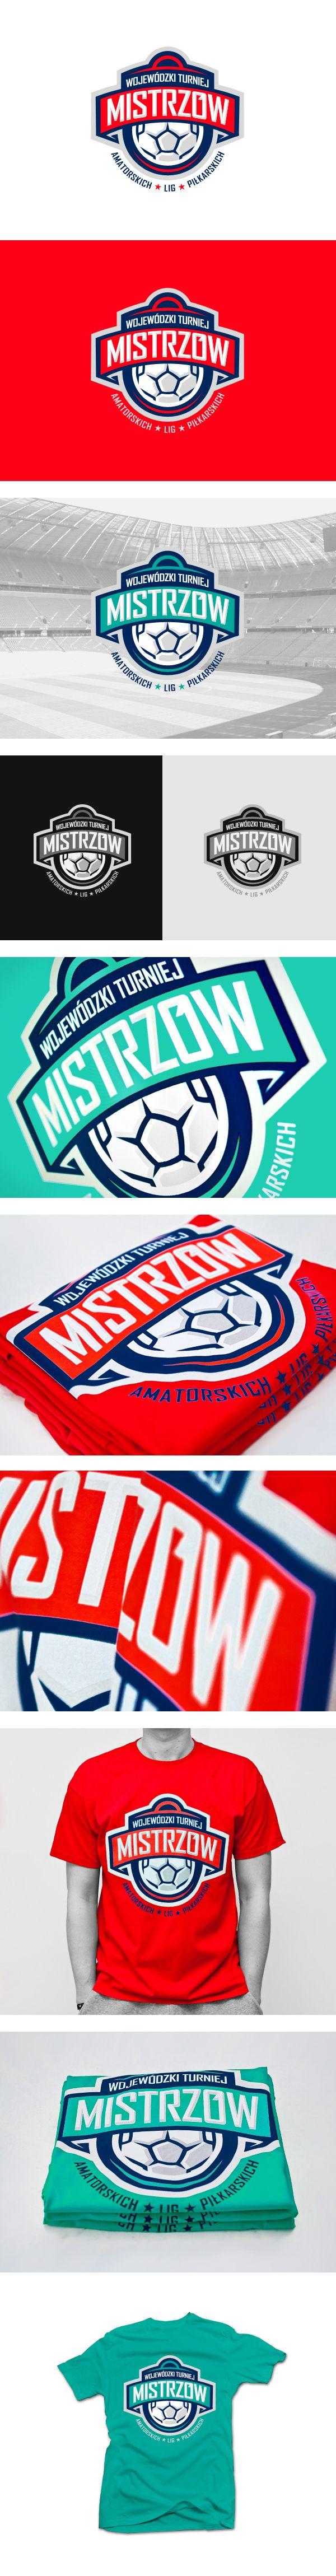 Football Tournament Logo by Lunatic, via Behance